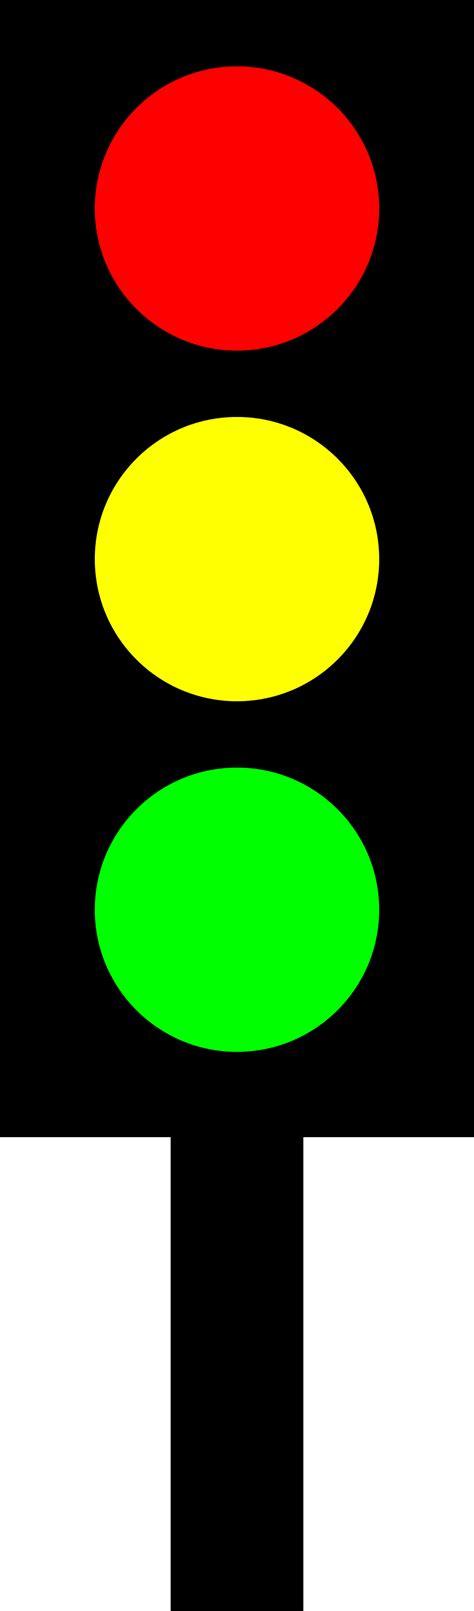 traffic light traffic light icon png www imgkid the image kid